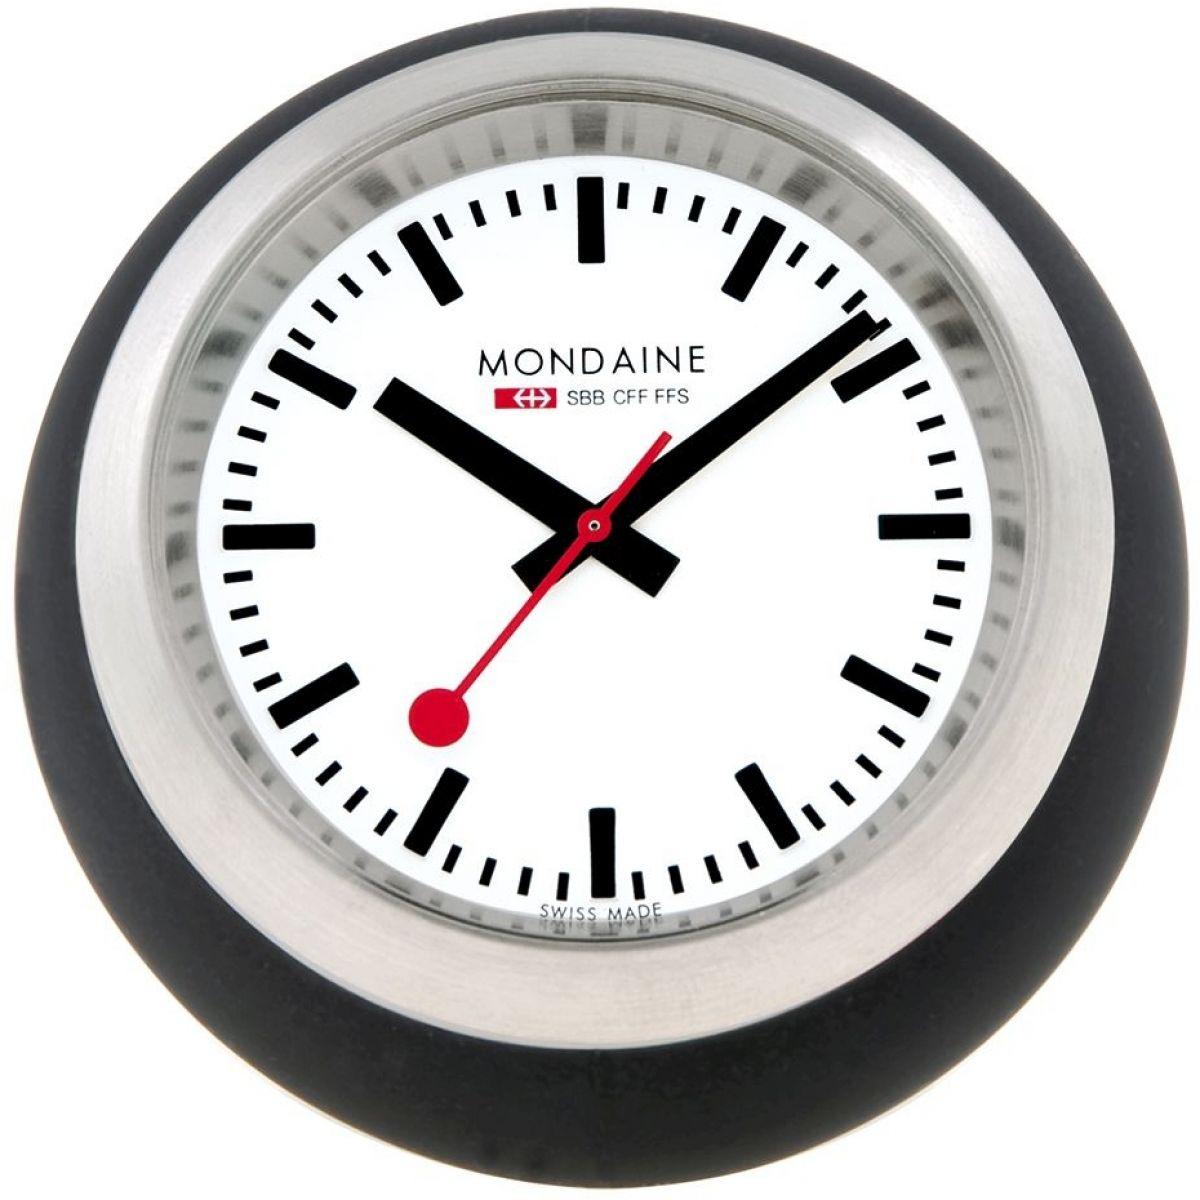 horloge mondaine suisse railways bureau horloge montre a6603033516sbb. Black Bedroom Furniture Sets. Home Design Ideas